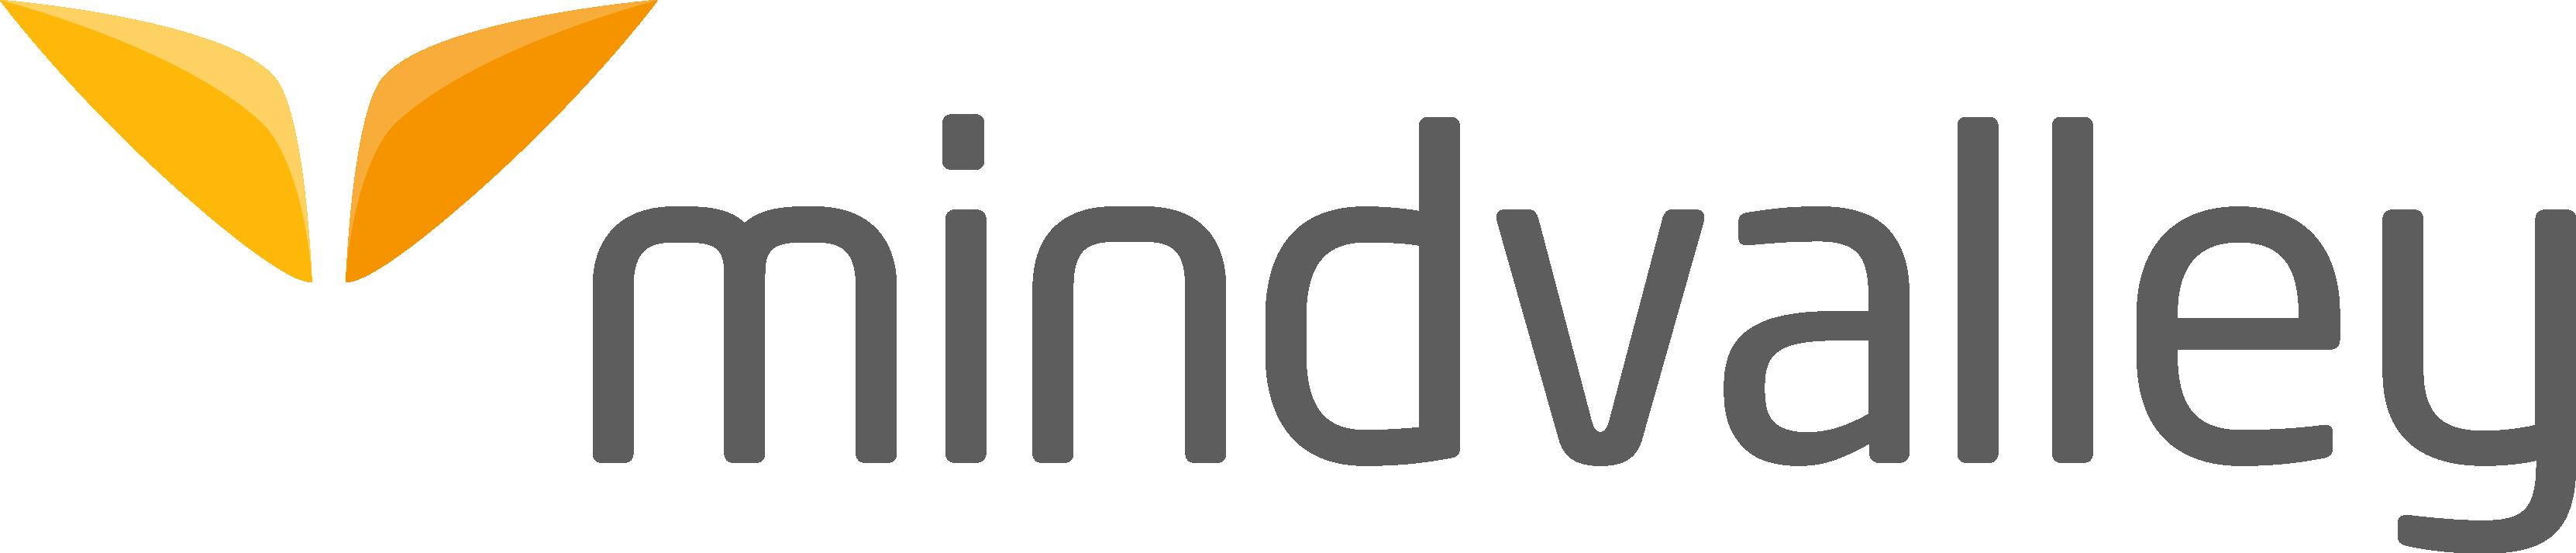 mv-logo-hori.png